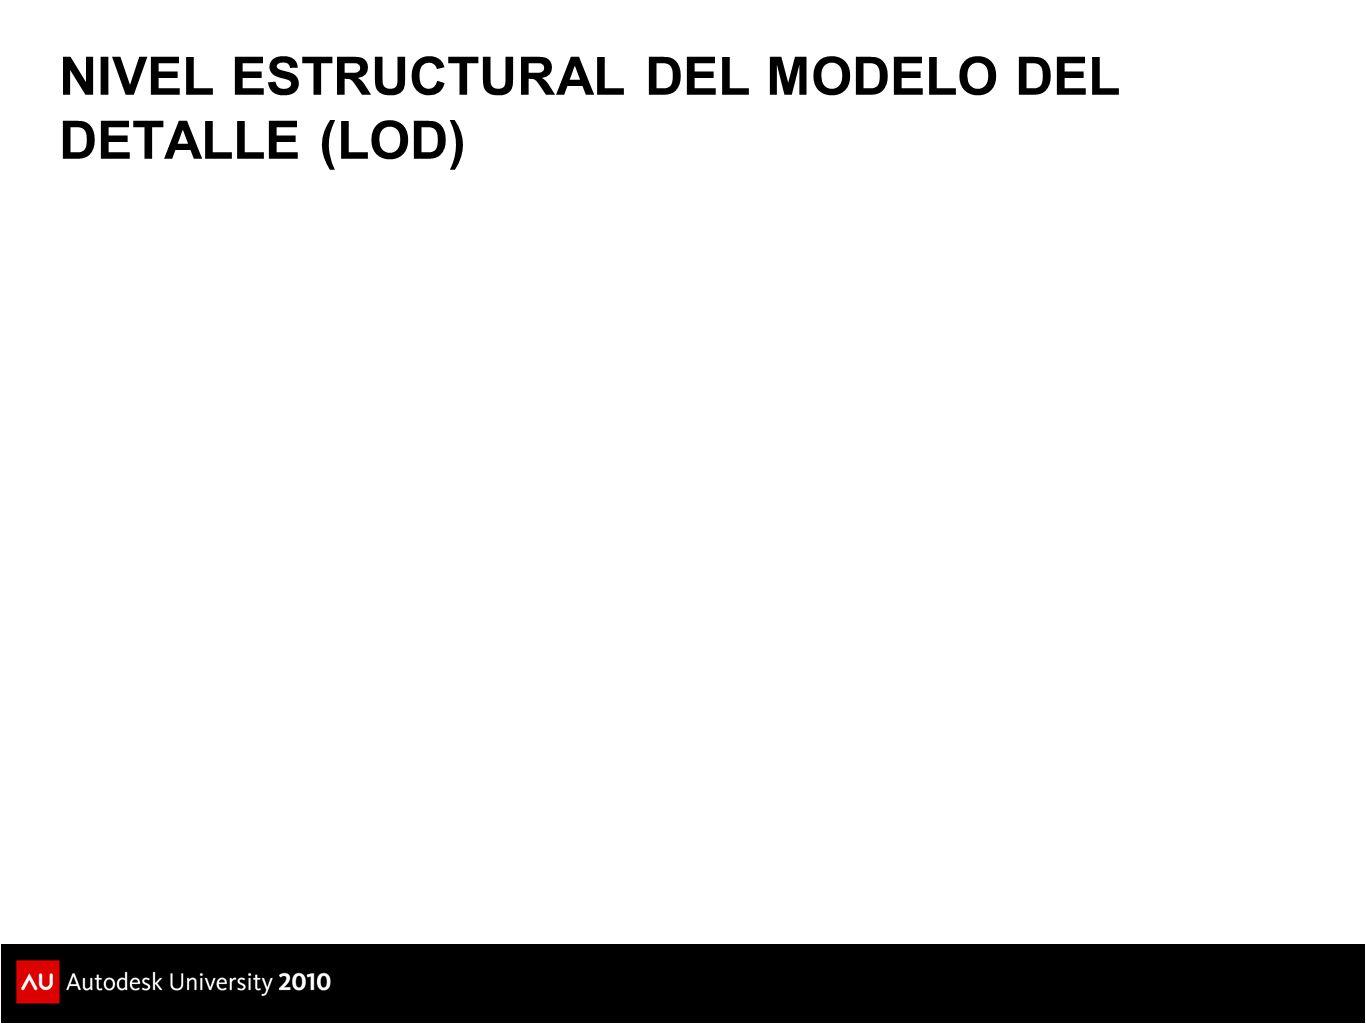 100 200300350400500 NIVEL ESTRUCTURAL DEL MODELO DEL DETALLE (LOD)